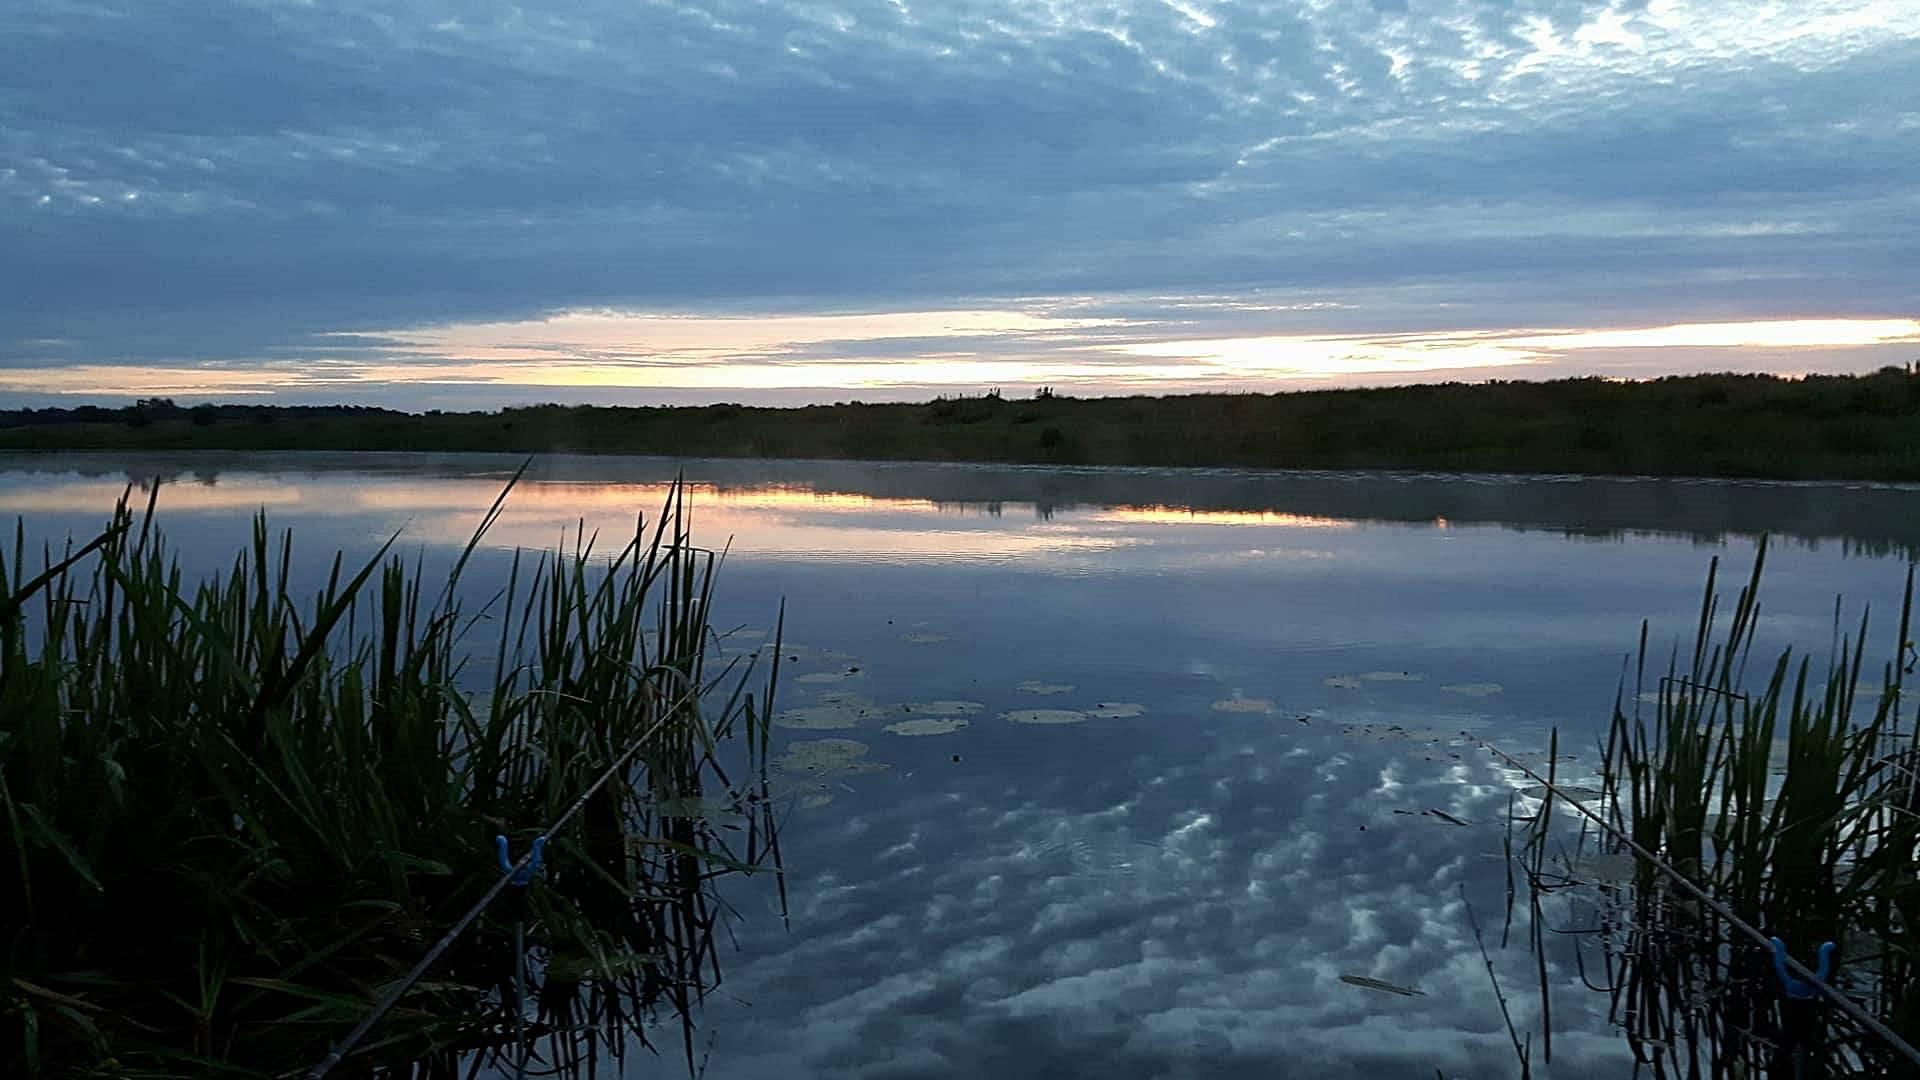 jezioro kielpiniec 2